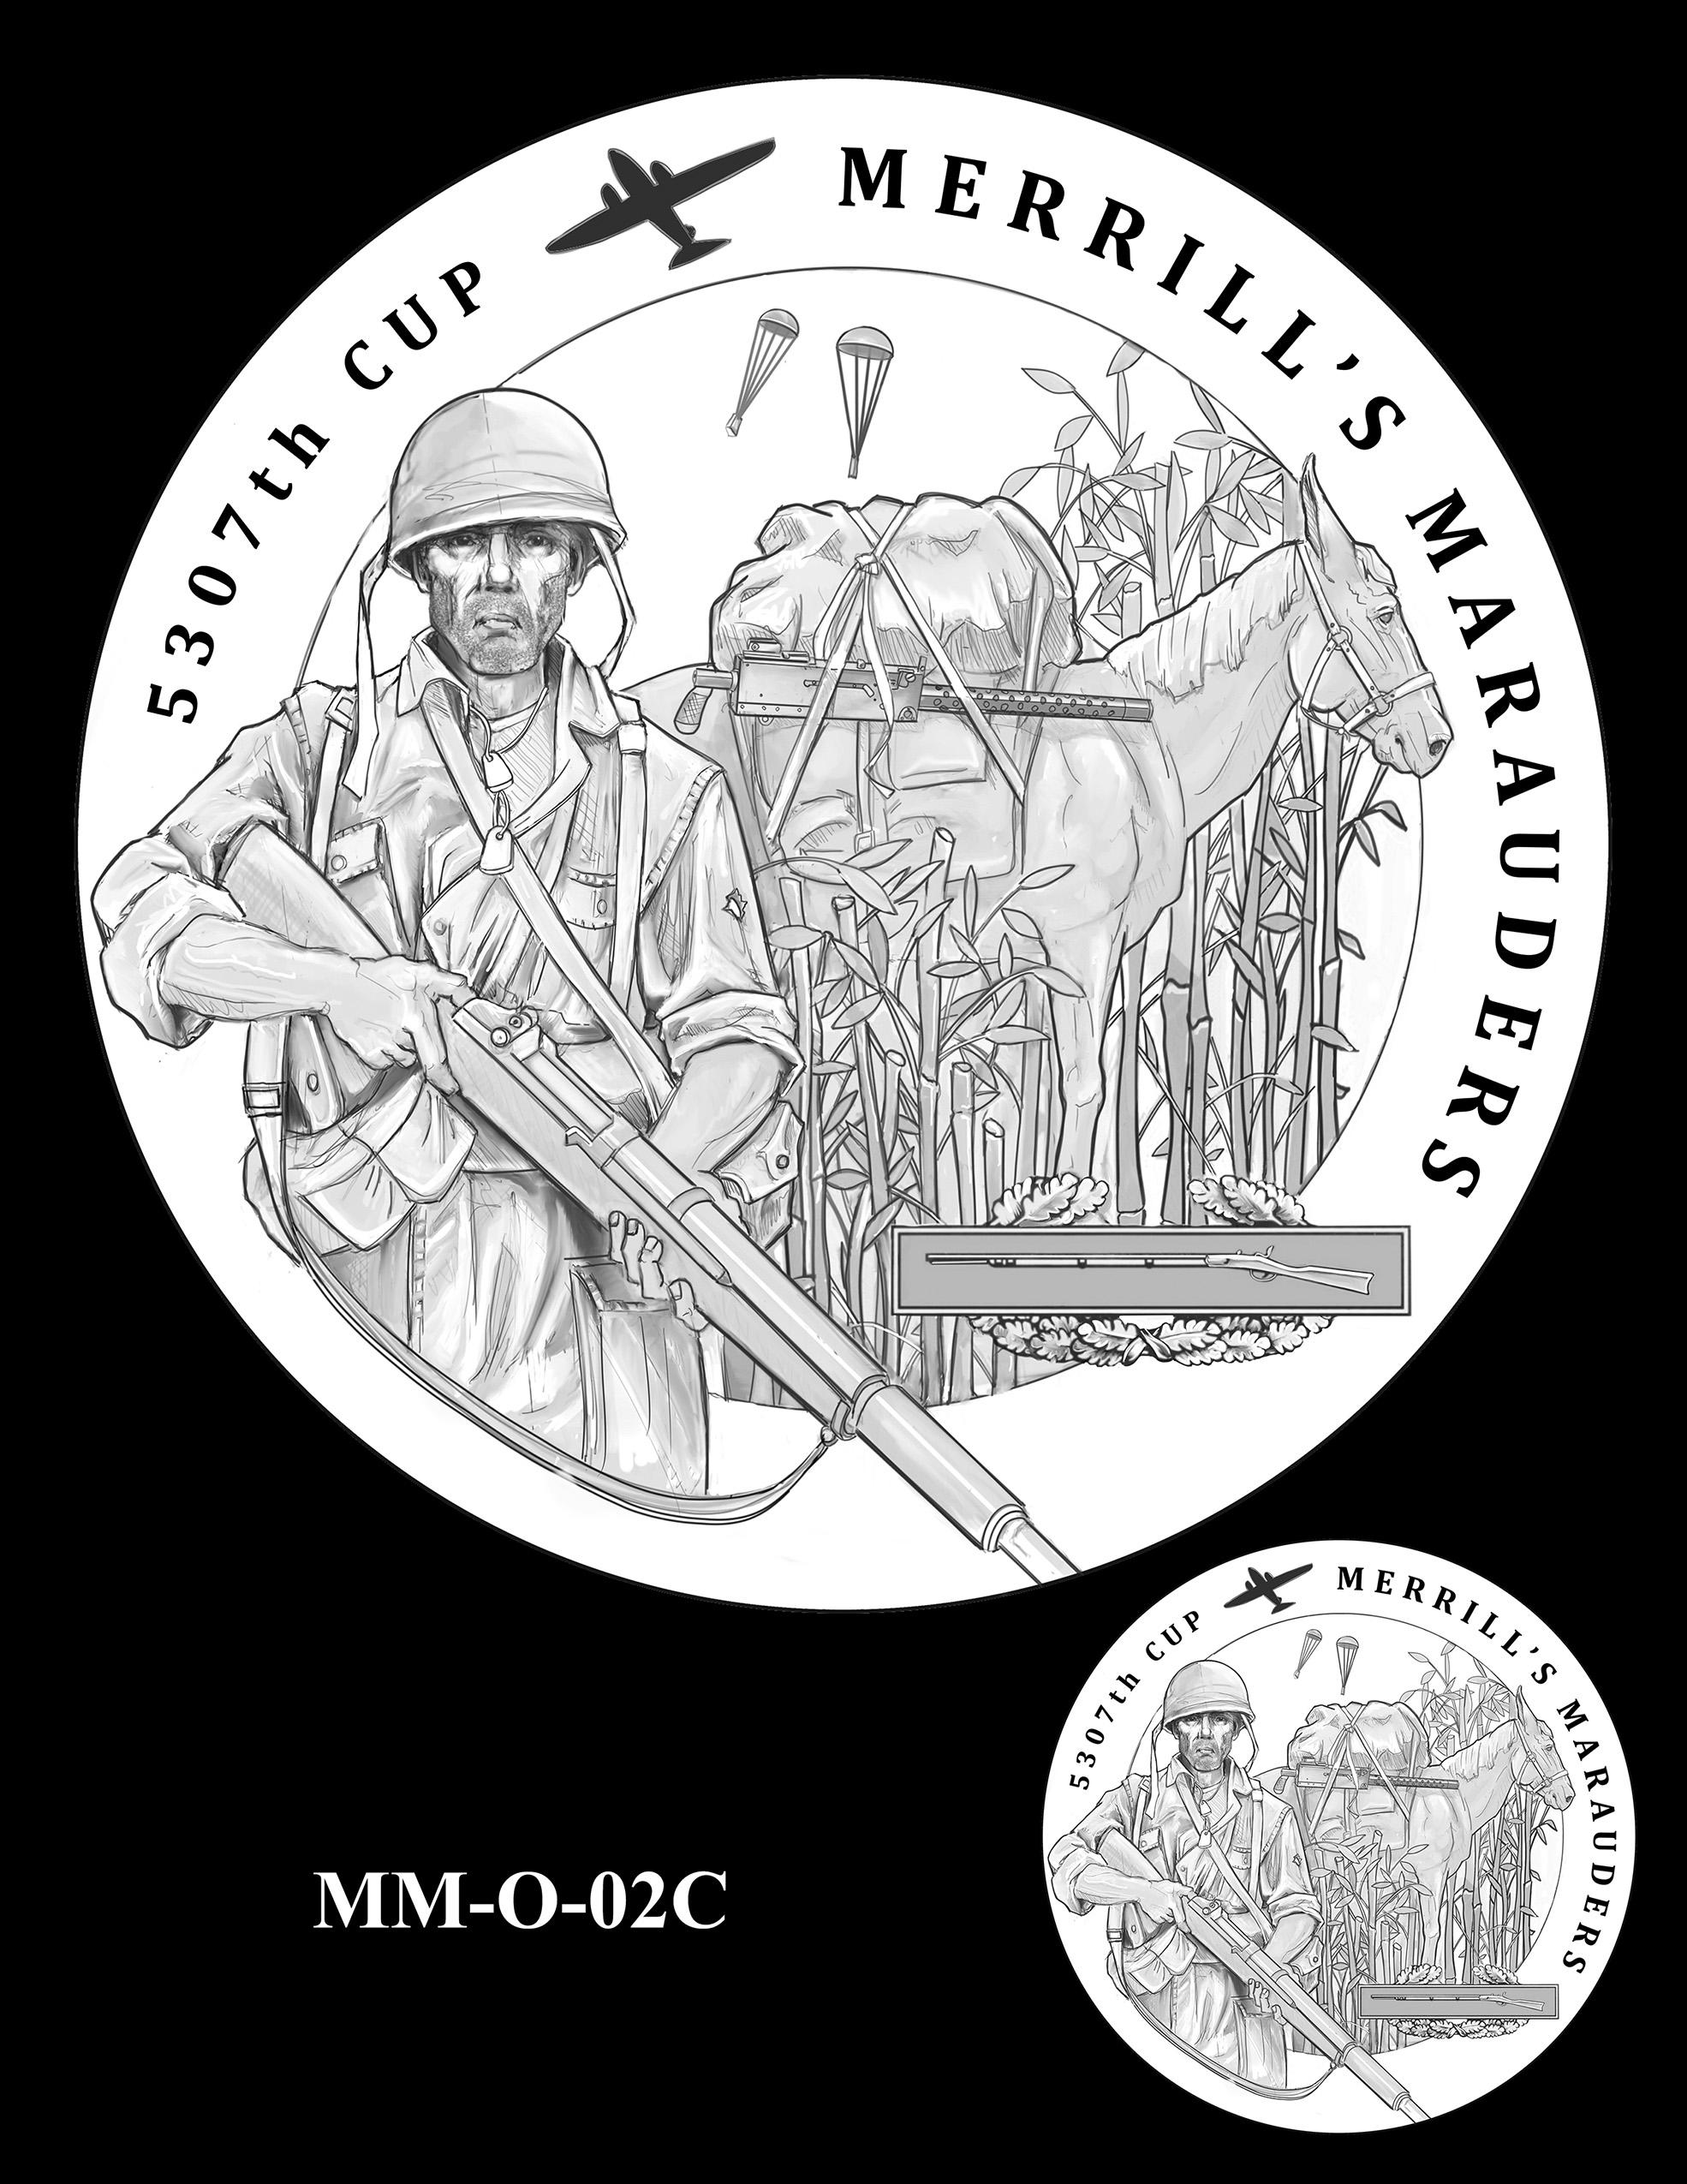 MM-O-02C -- Merrill's Marauders Congressional Gold Medal